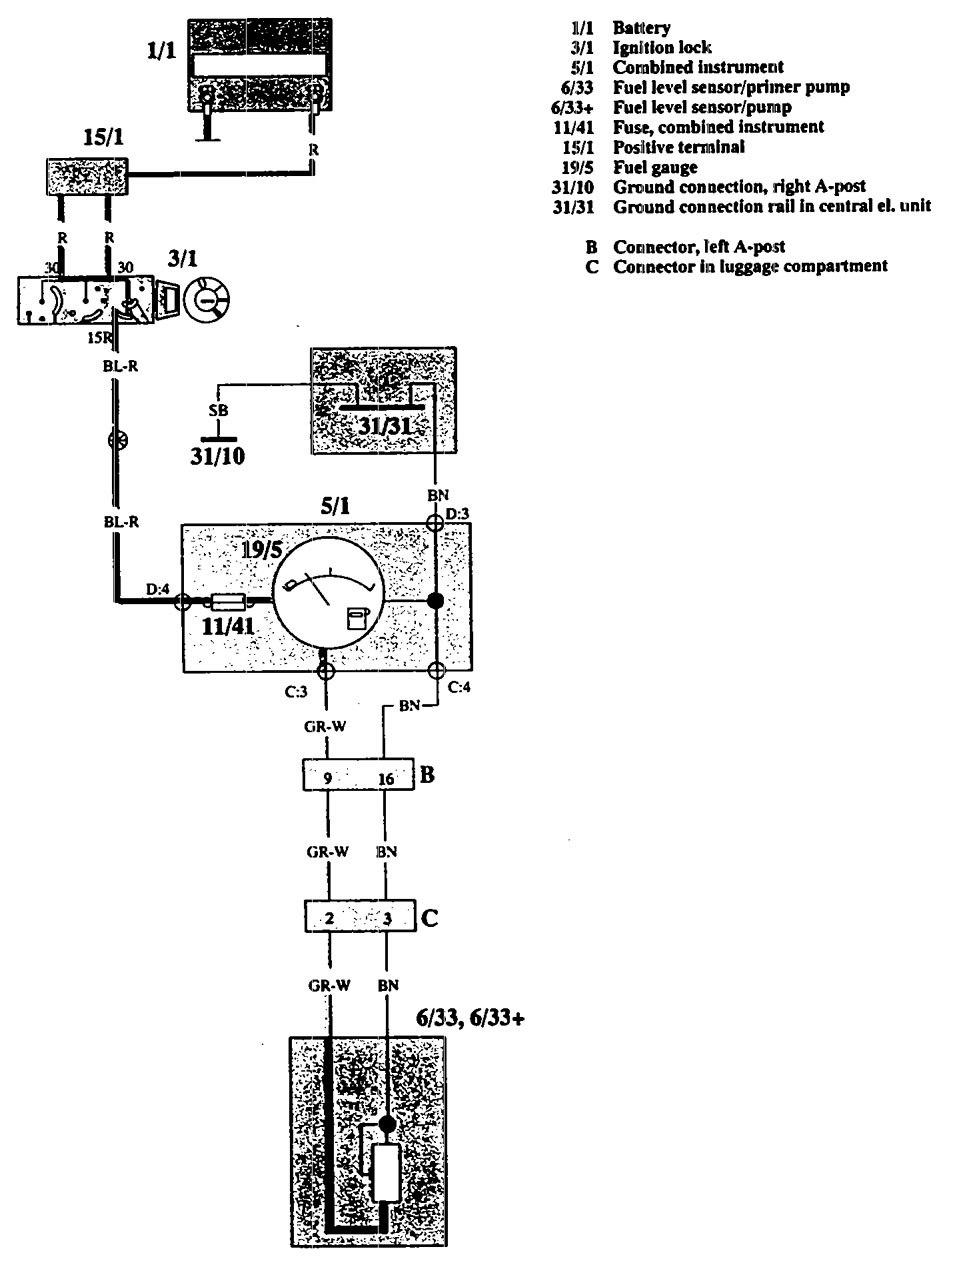 hight resolution of volvo 740 1992 wiring diagrams fuel warning acura rsx fuse diagram 1990 acura integra fuse box